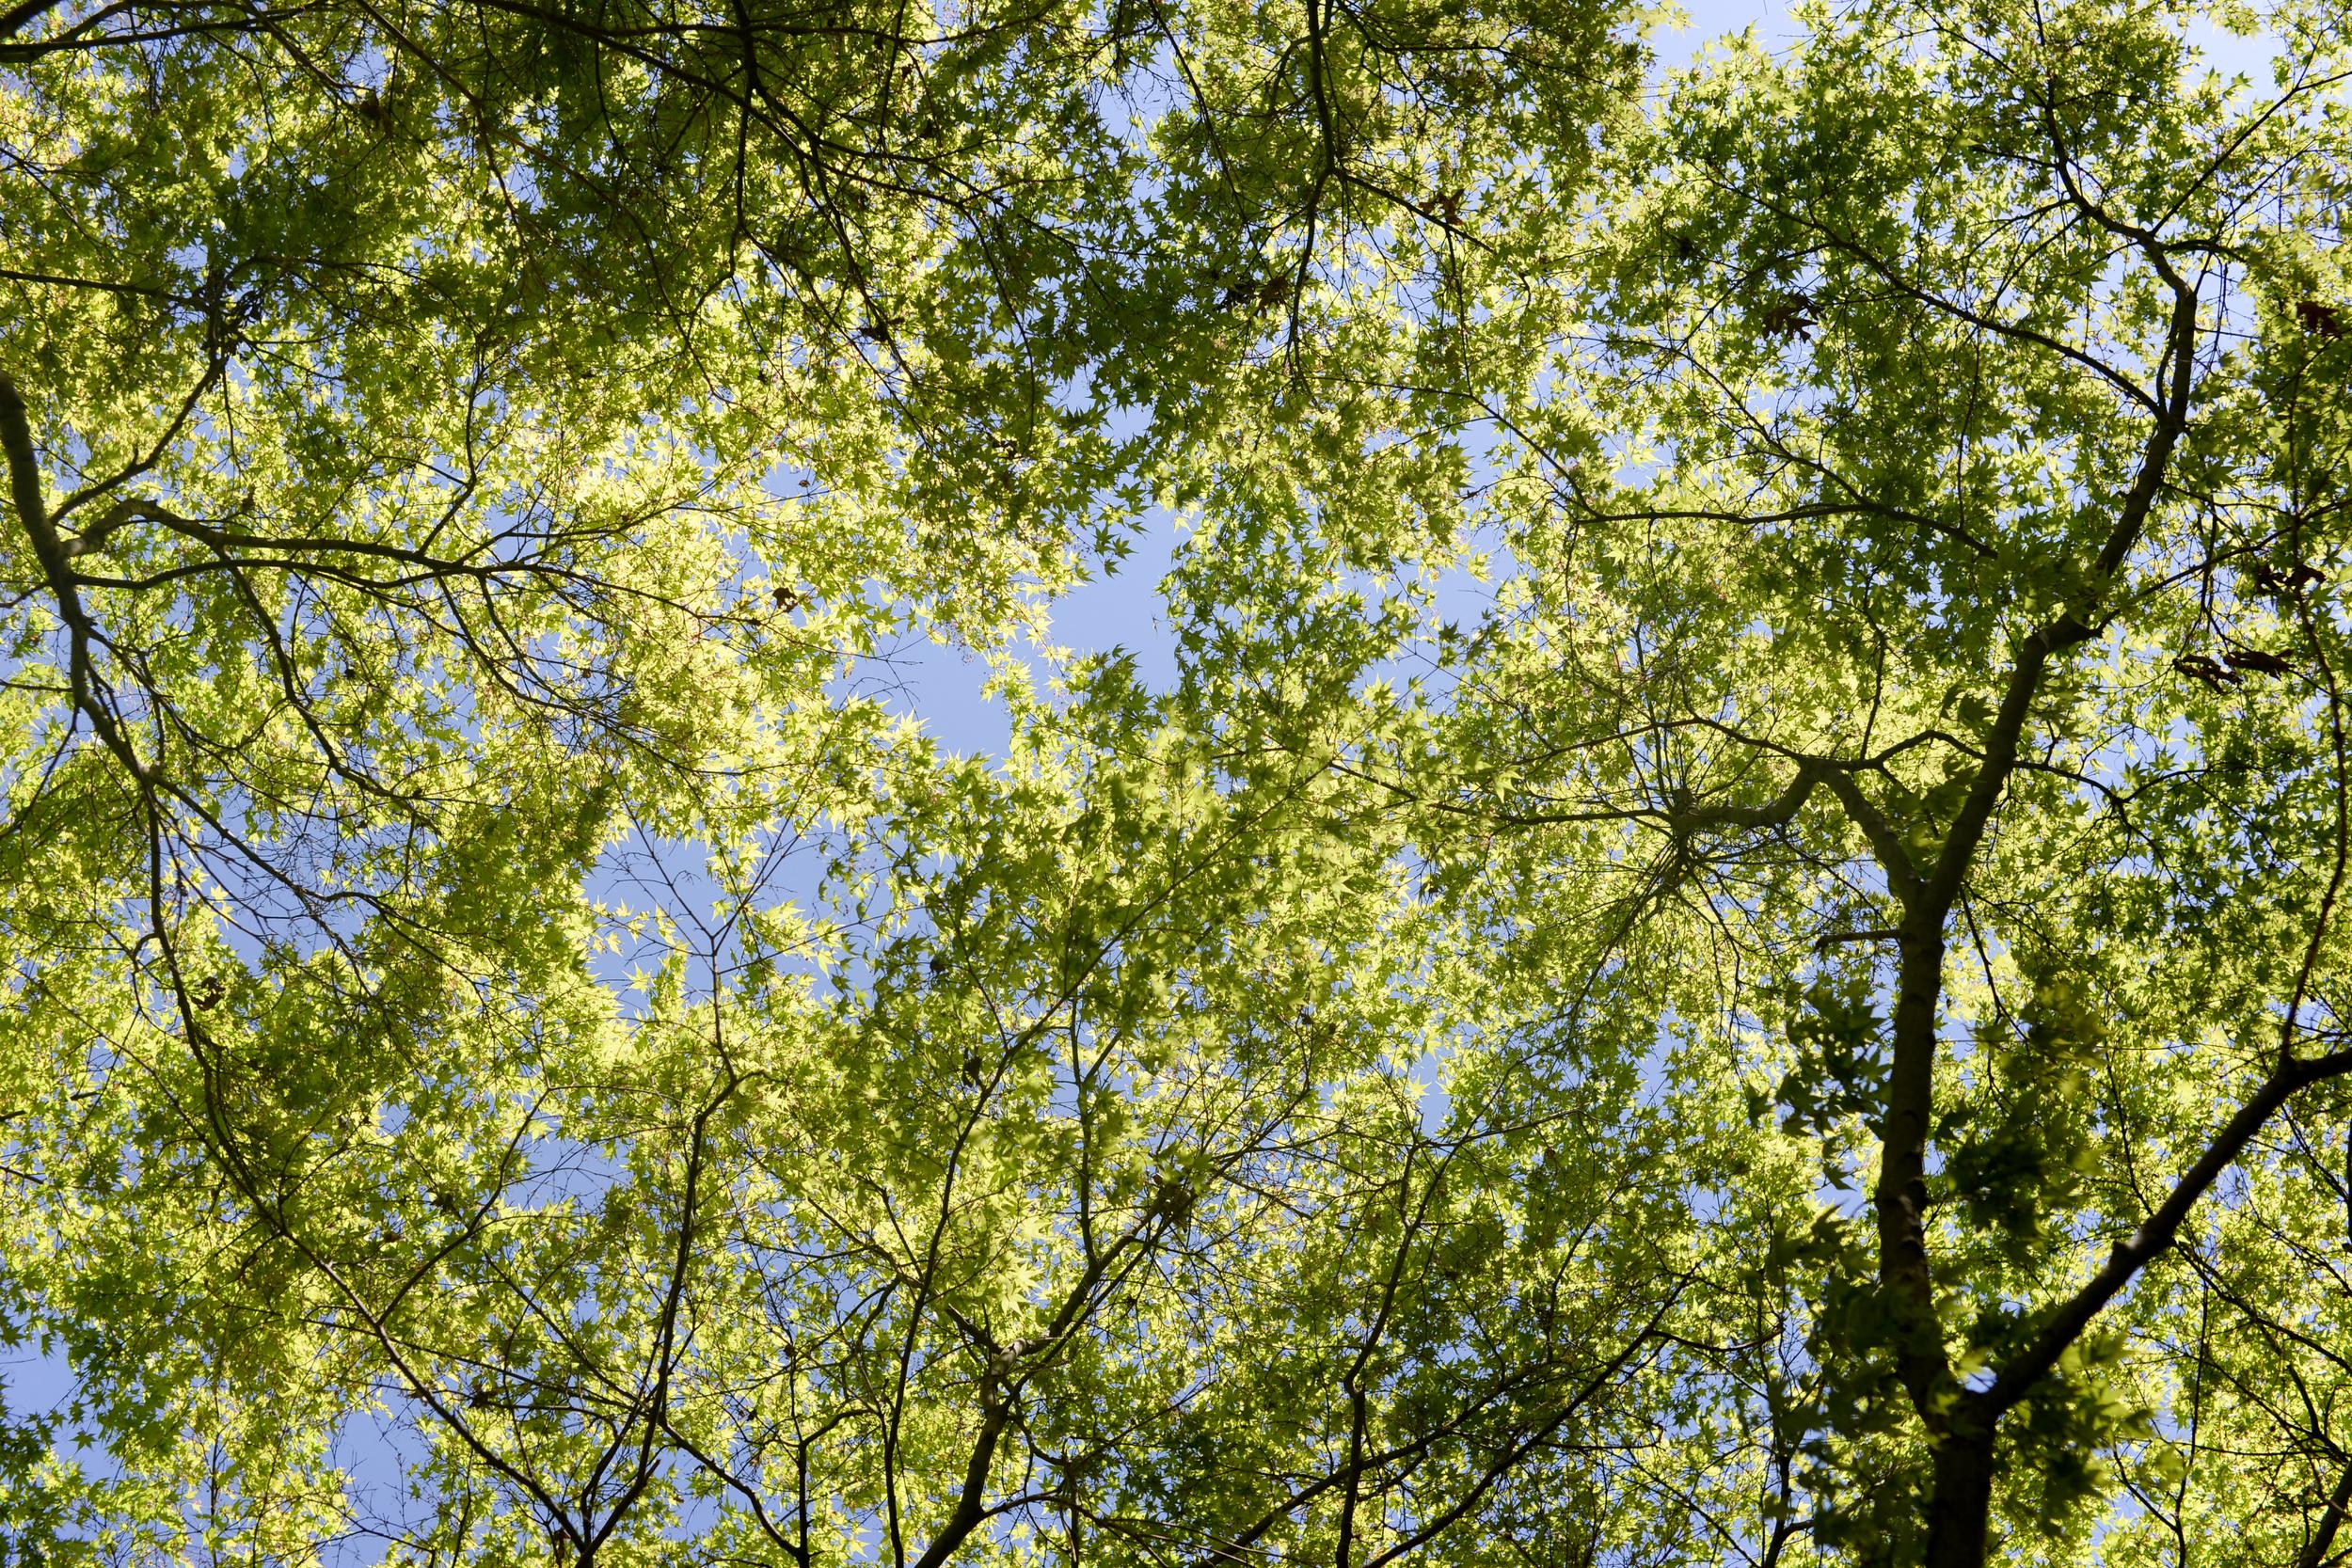 150404_hkp_botanicalgardens021.jpg